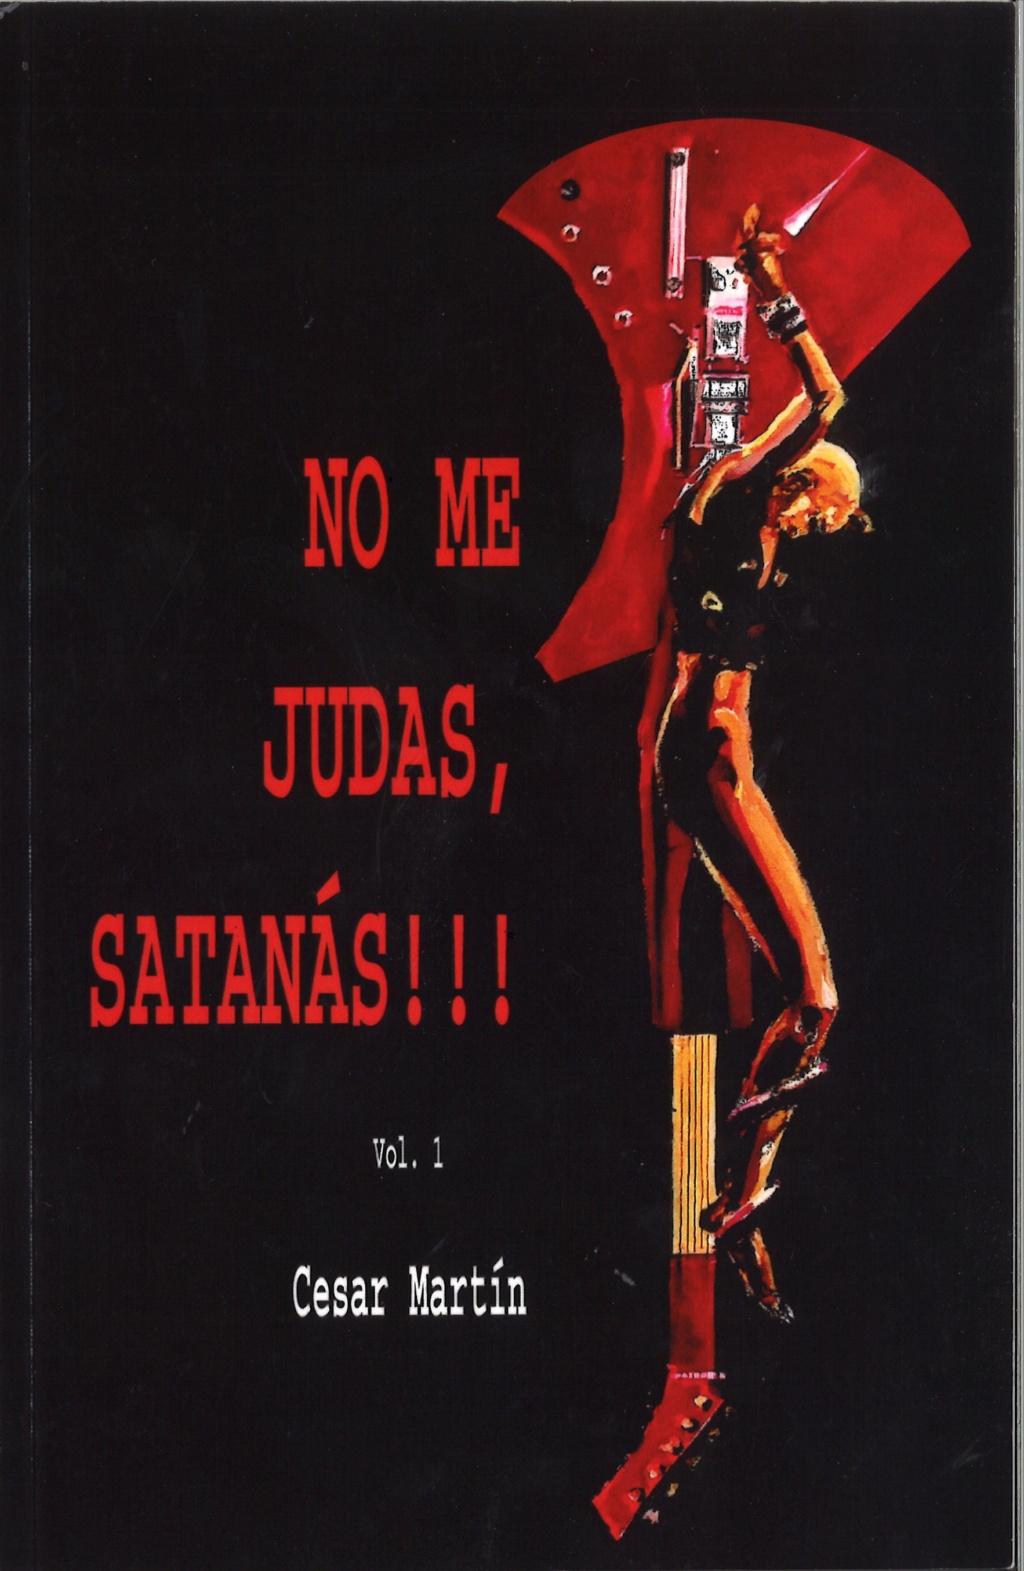 Popular 1 - NO ME JUDAS SATANAS - Página 17 2640_010